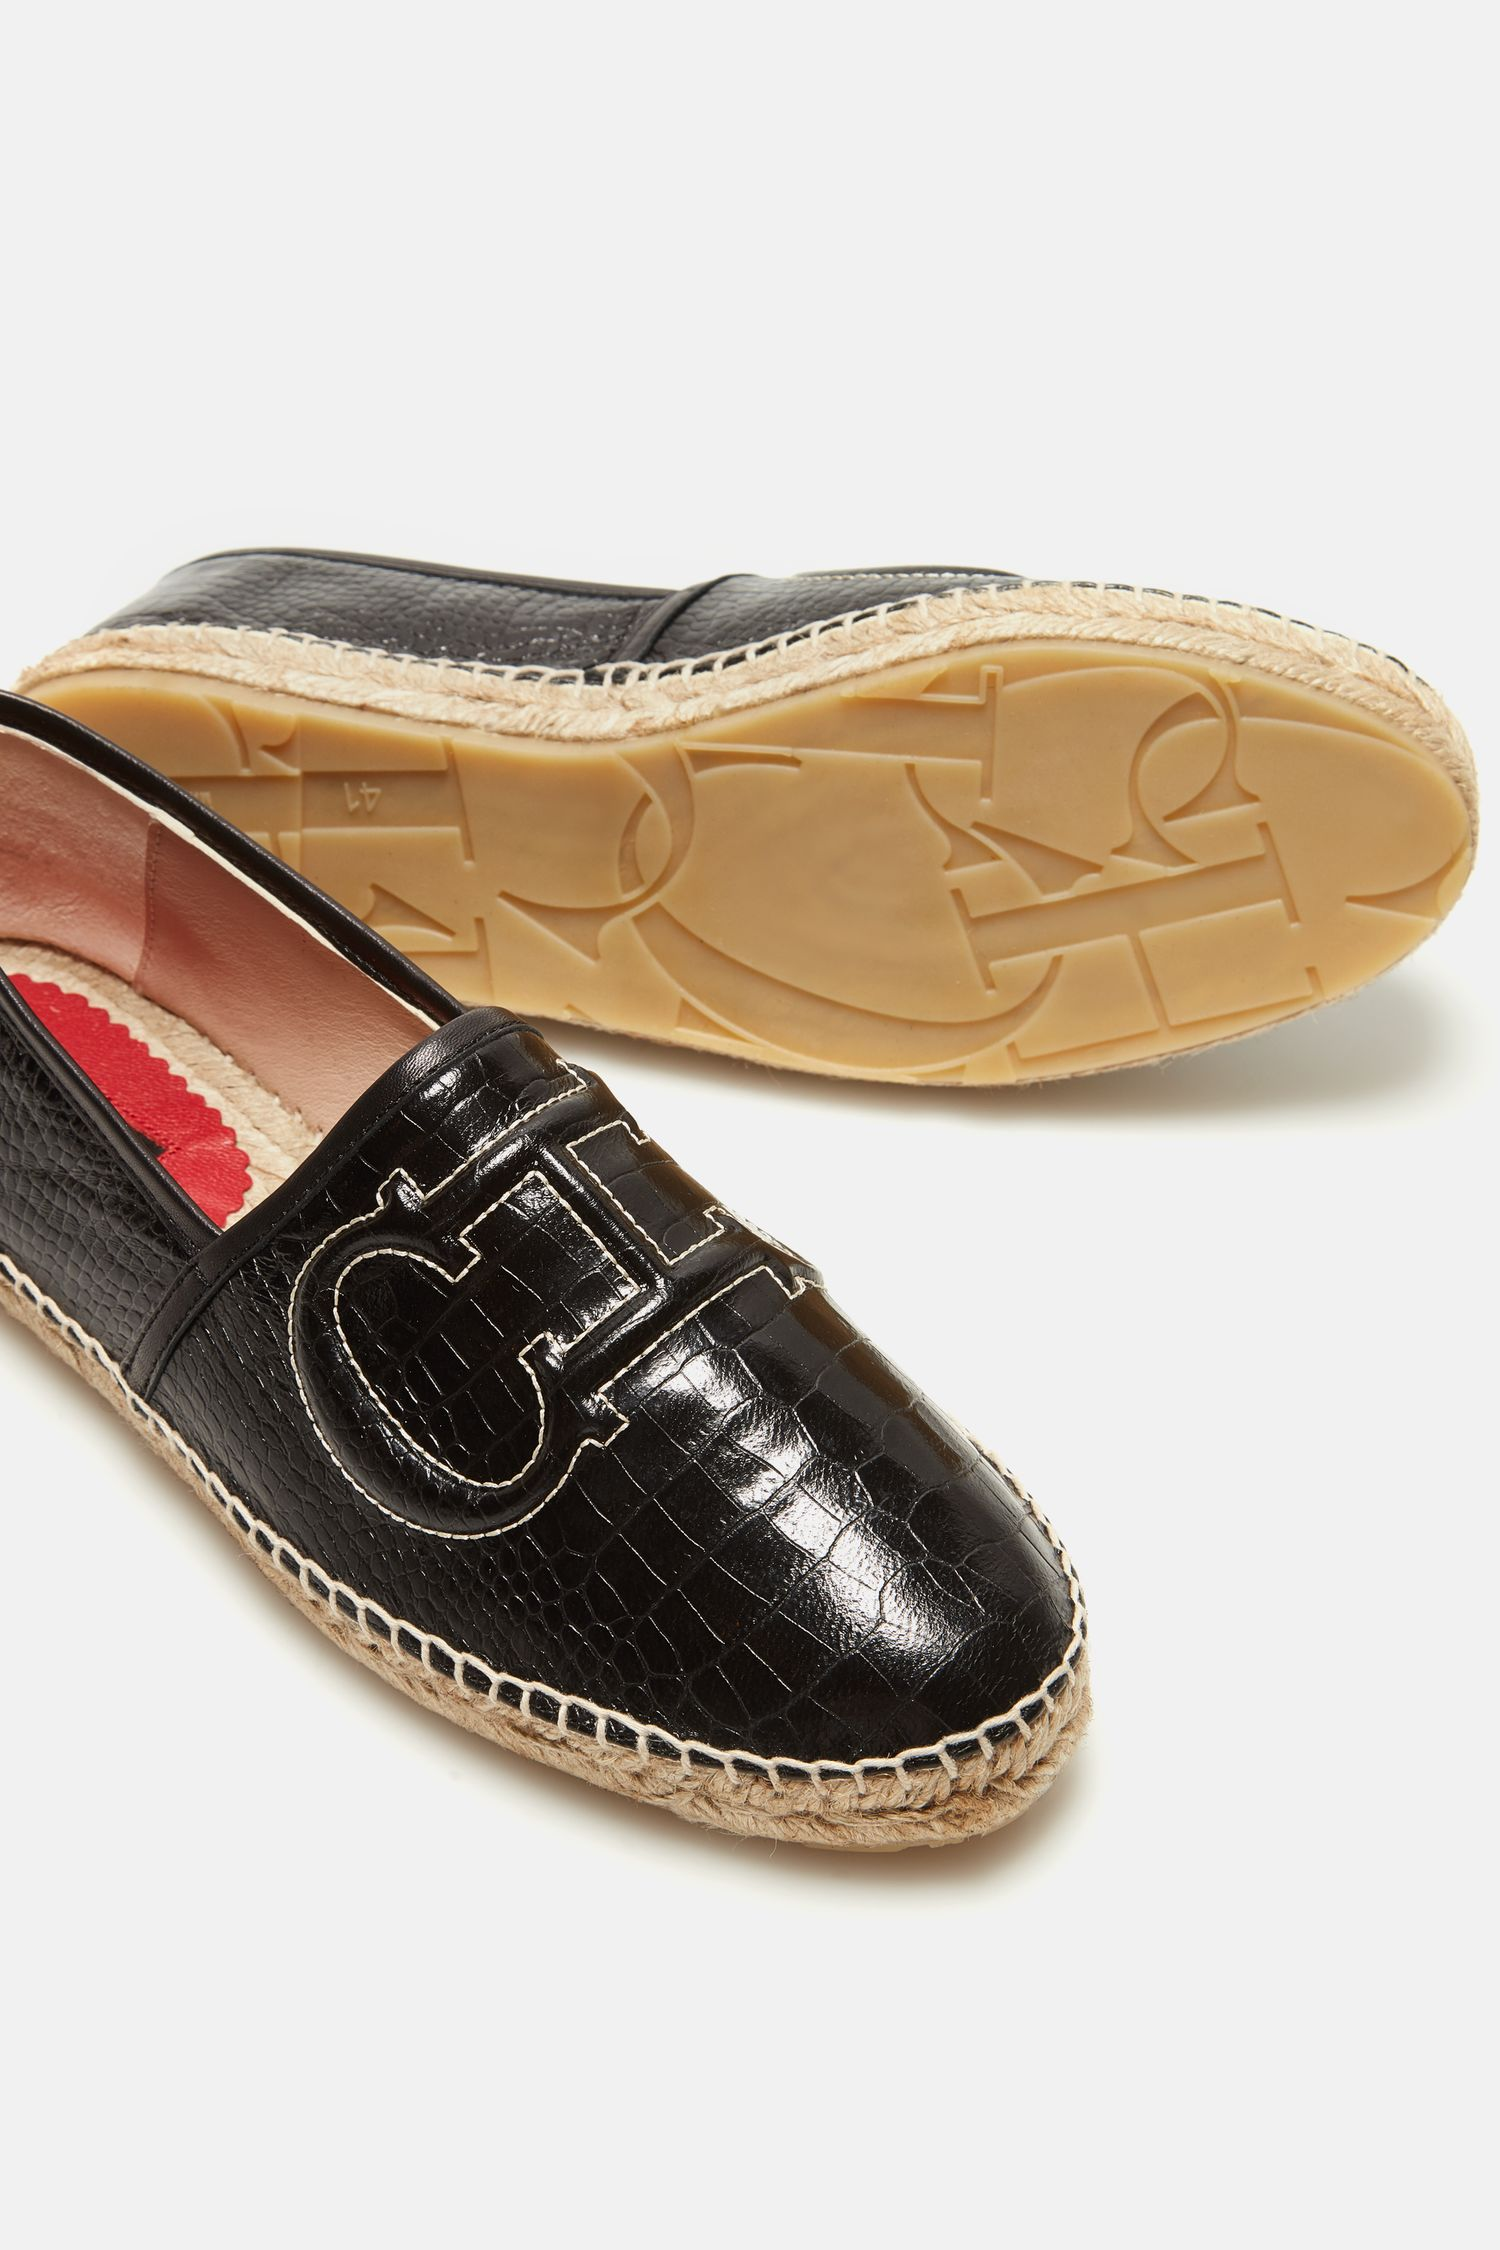 Initials Insignia croc-effect leather espadrilles